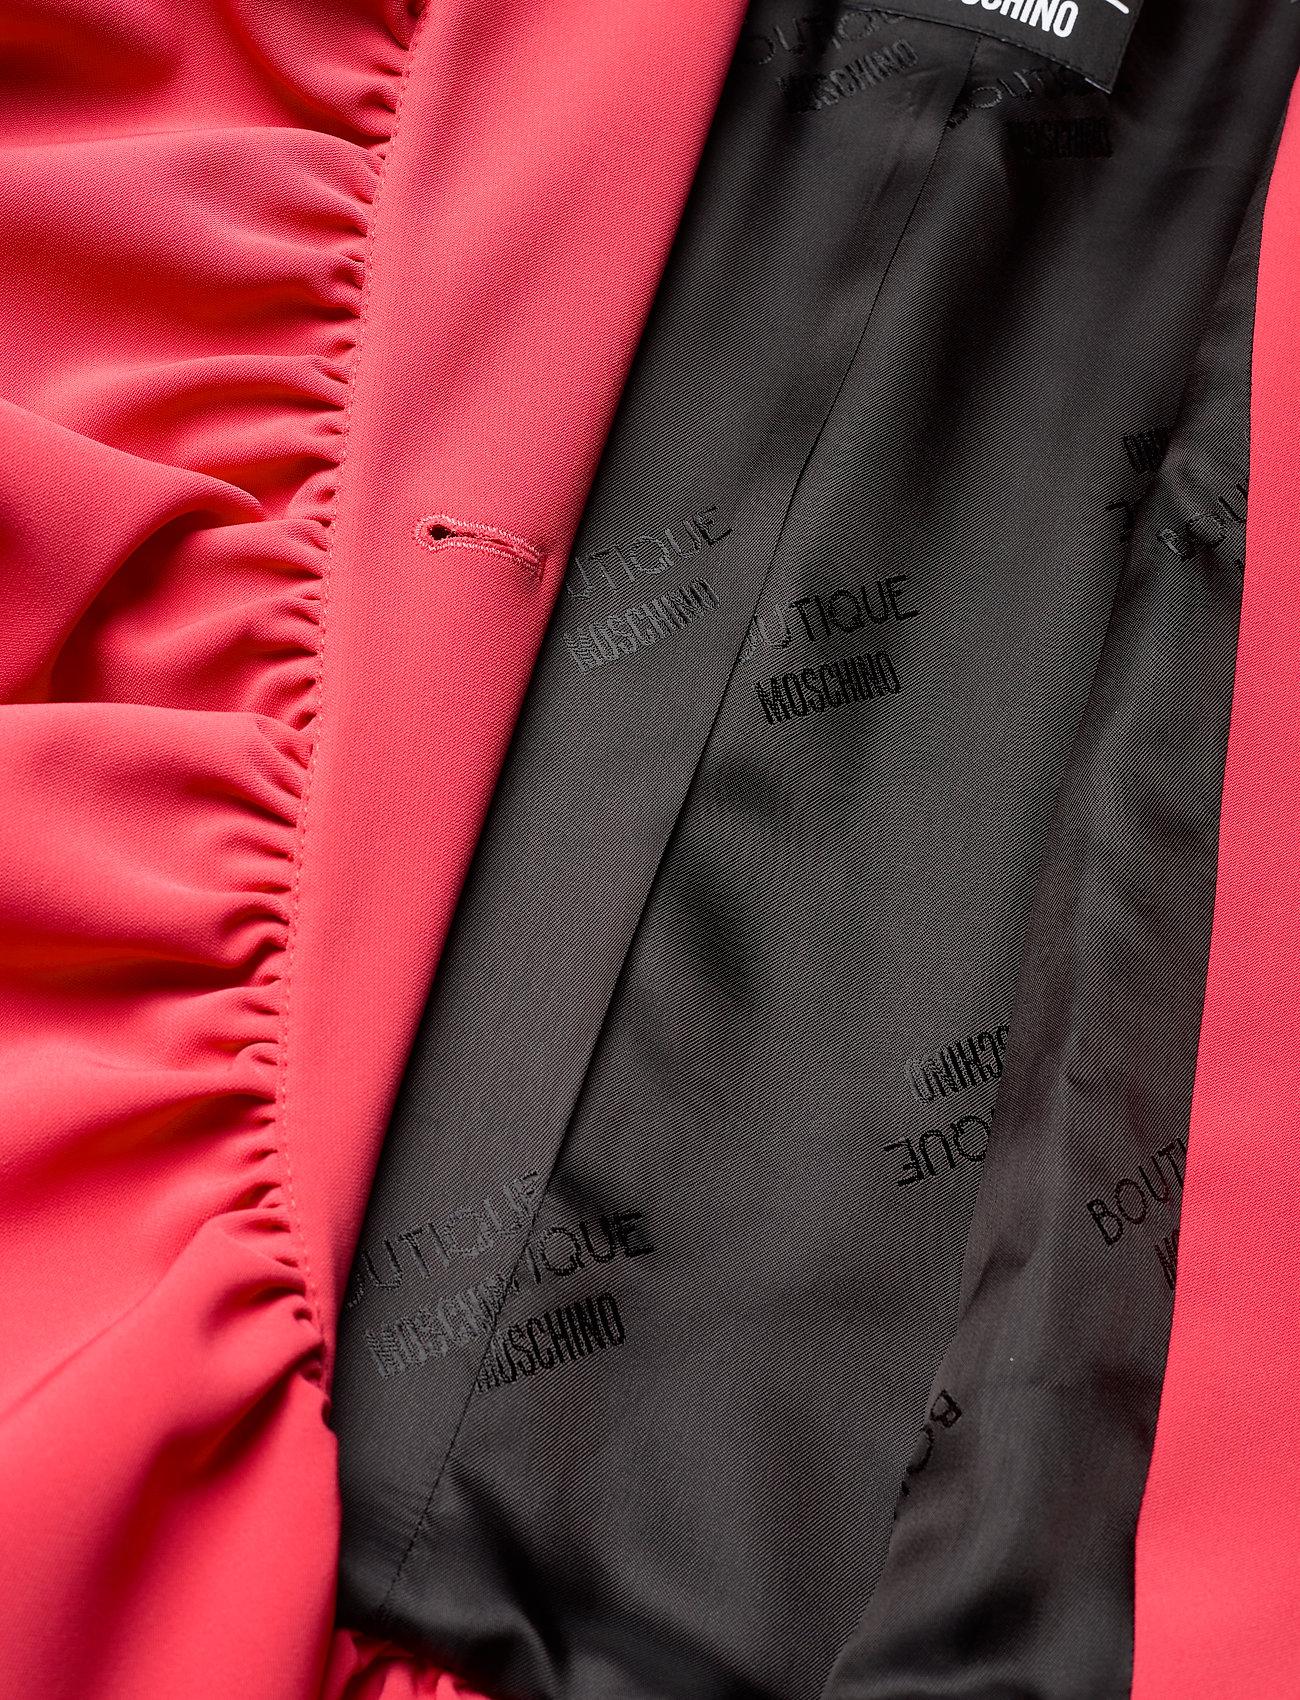 Boutique Moschino - Boutique Moschino JACKET - tøj - pink - 3